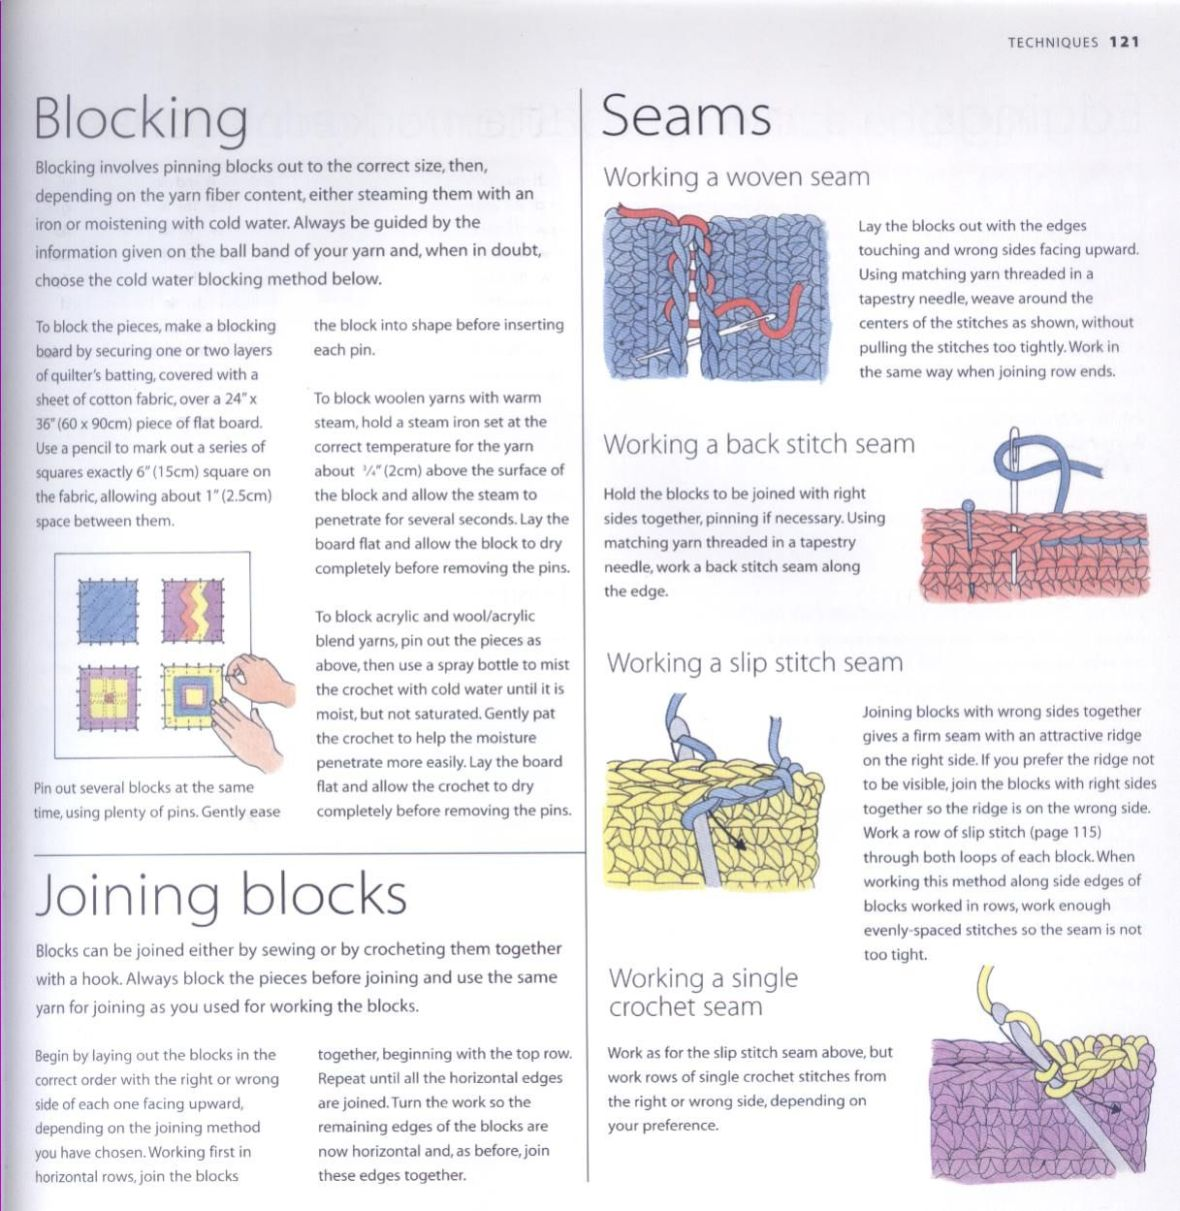 200 Crocheted Blocks for blankets, throws & Afghans 121